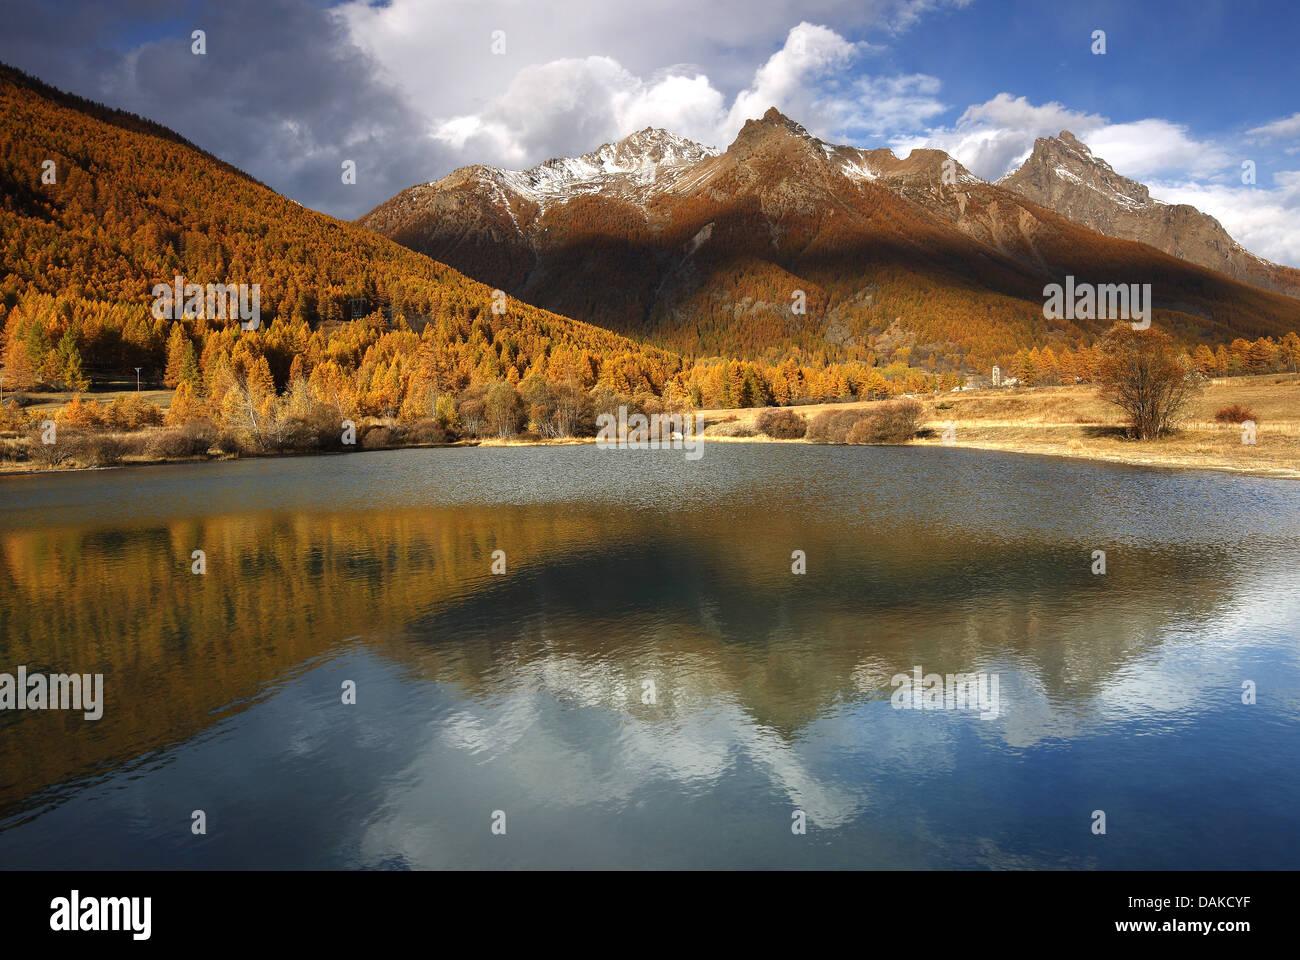 Larice comune, EUROPEE Larice (Larix decidua, Larix europaea), Valle de la Guisane; Montagne des Agnelli, Francia Immagini Stock